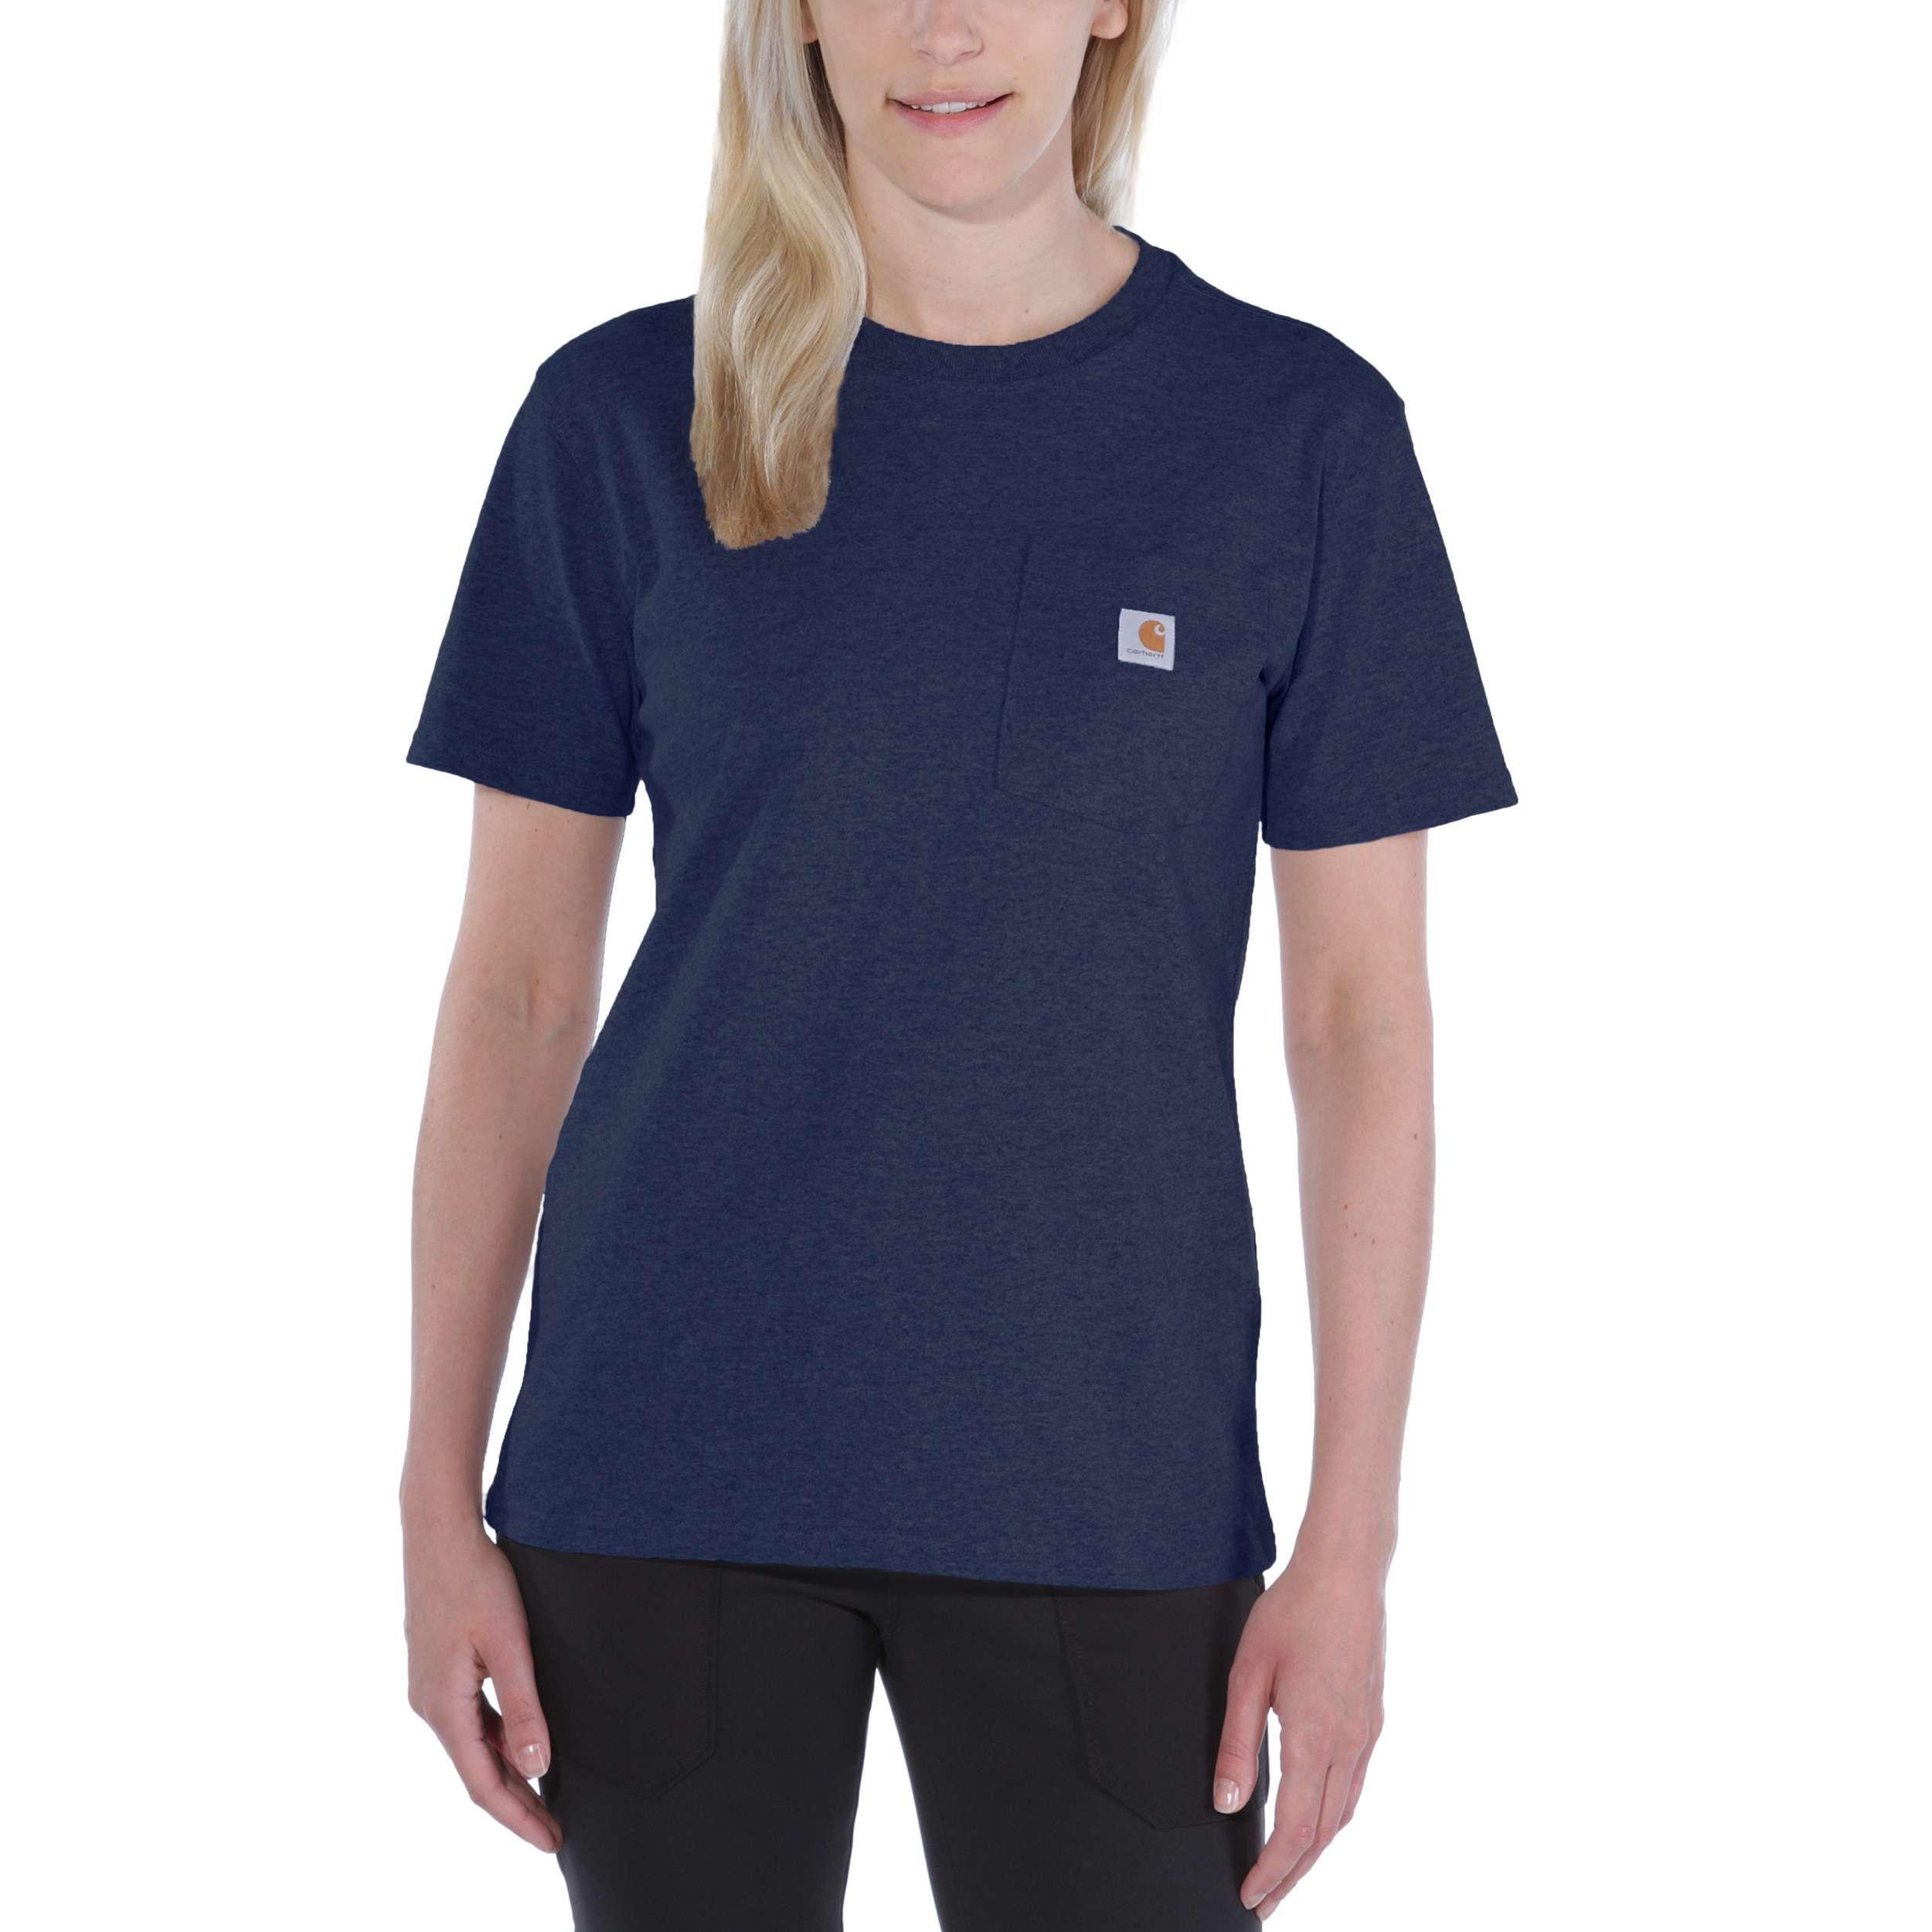 Футболка женская Carhartt WK87 Workwear Pocket T-Shirt - 103067 (Navy)